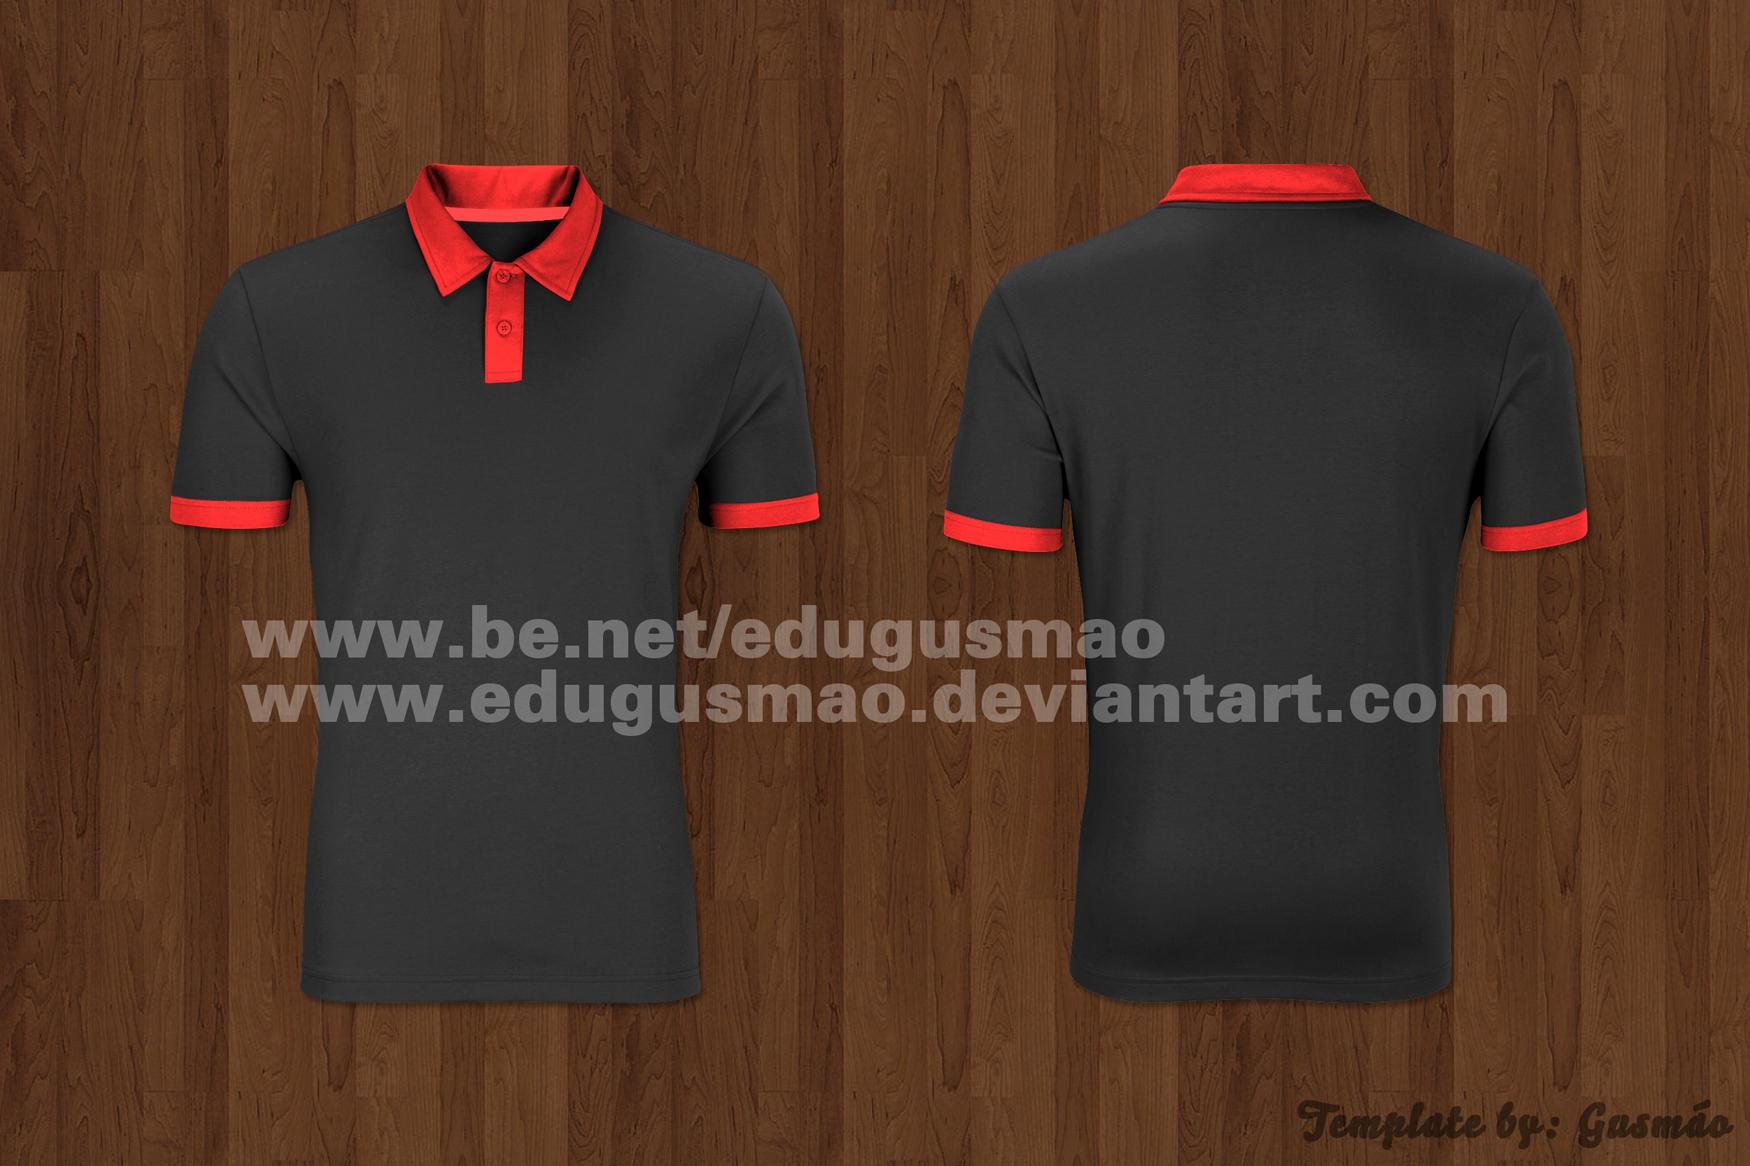 Shirt design photoshop template - Sweat Shirt Psd By Grahamphisherdotcom Template Blusa Polo By Edugusmao